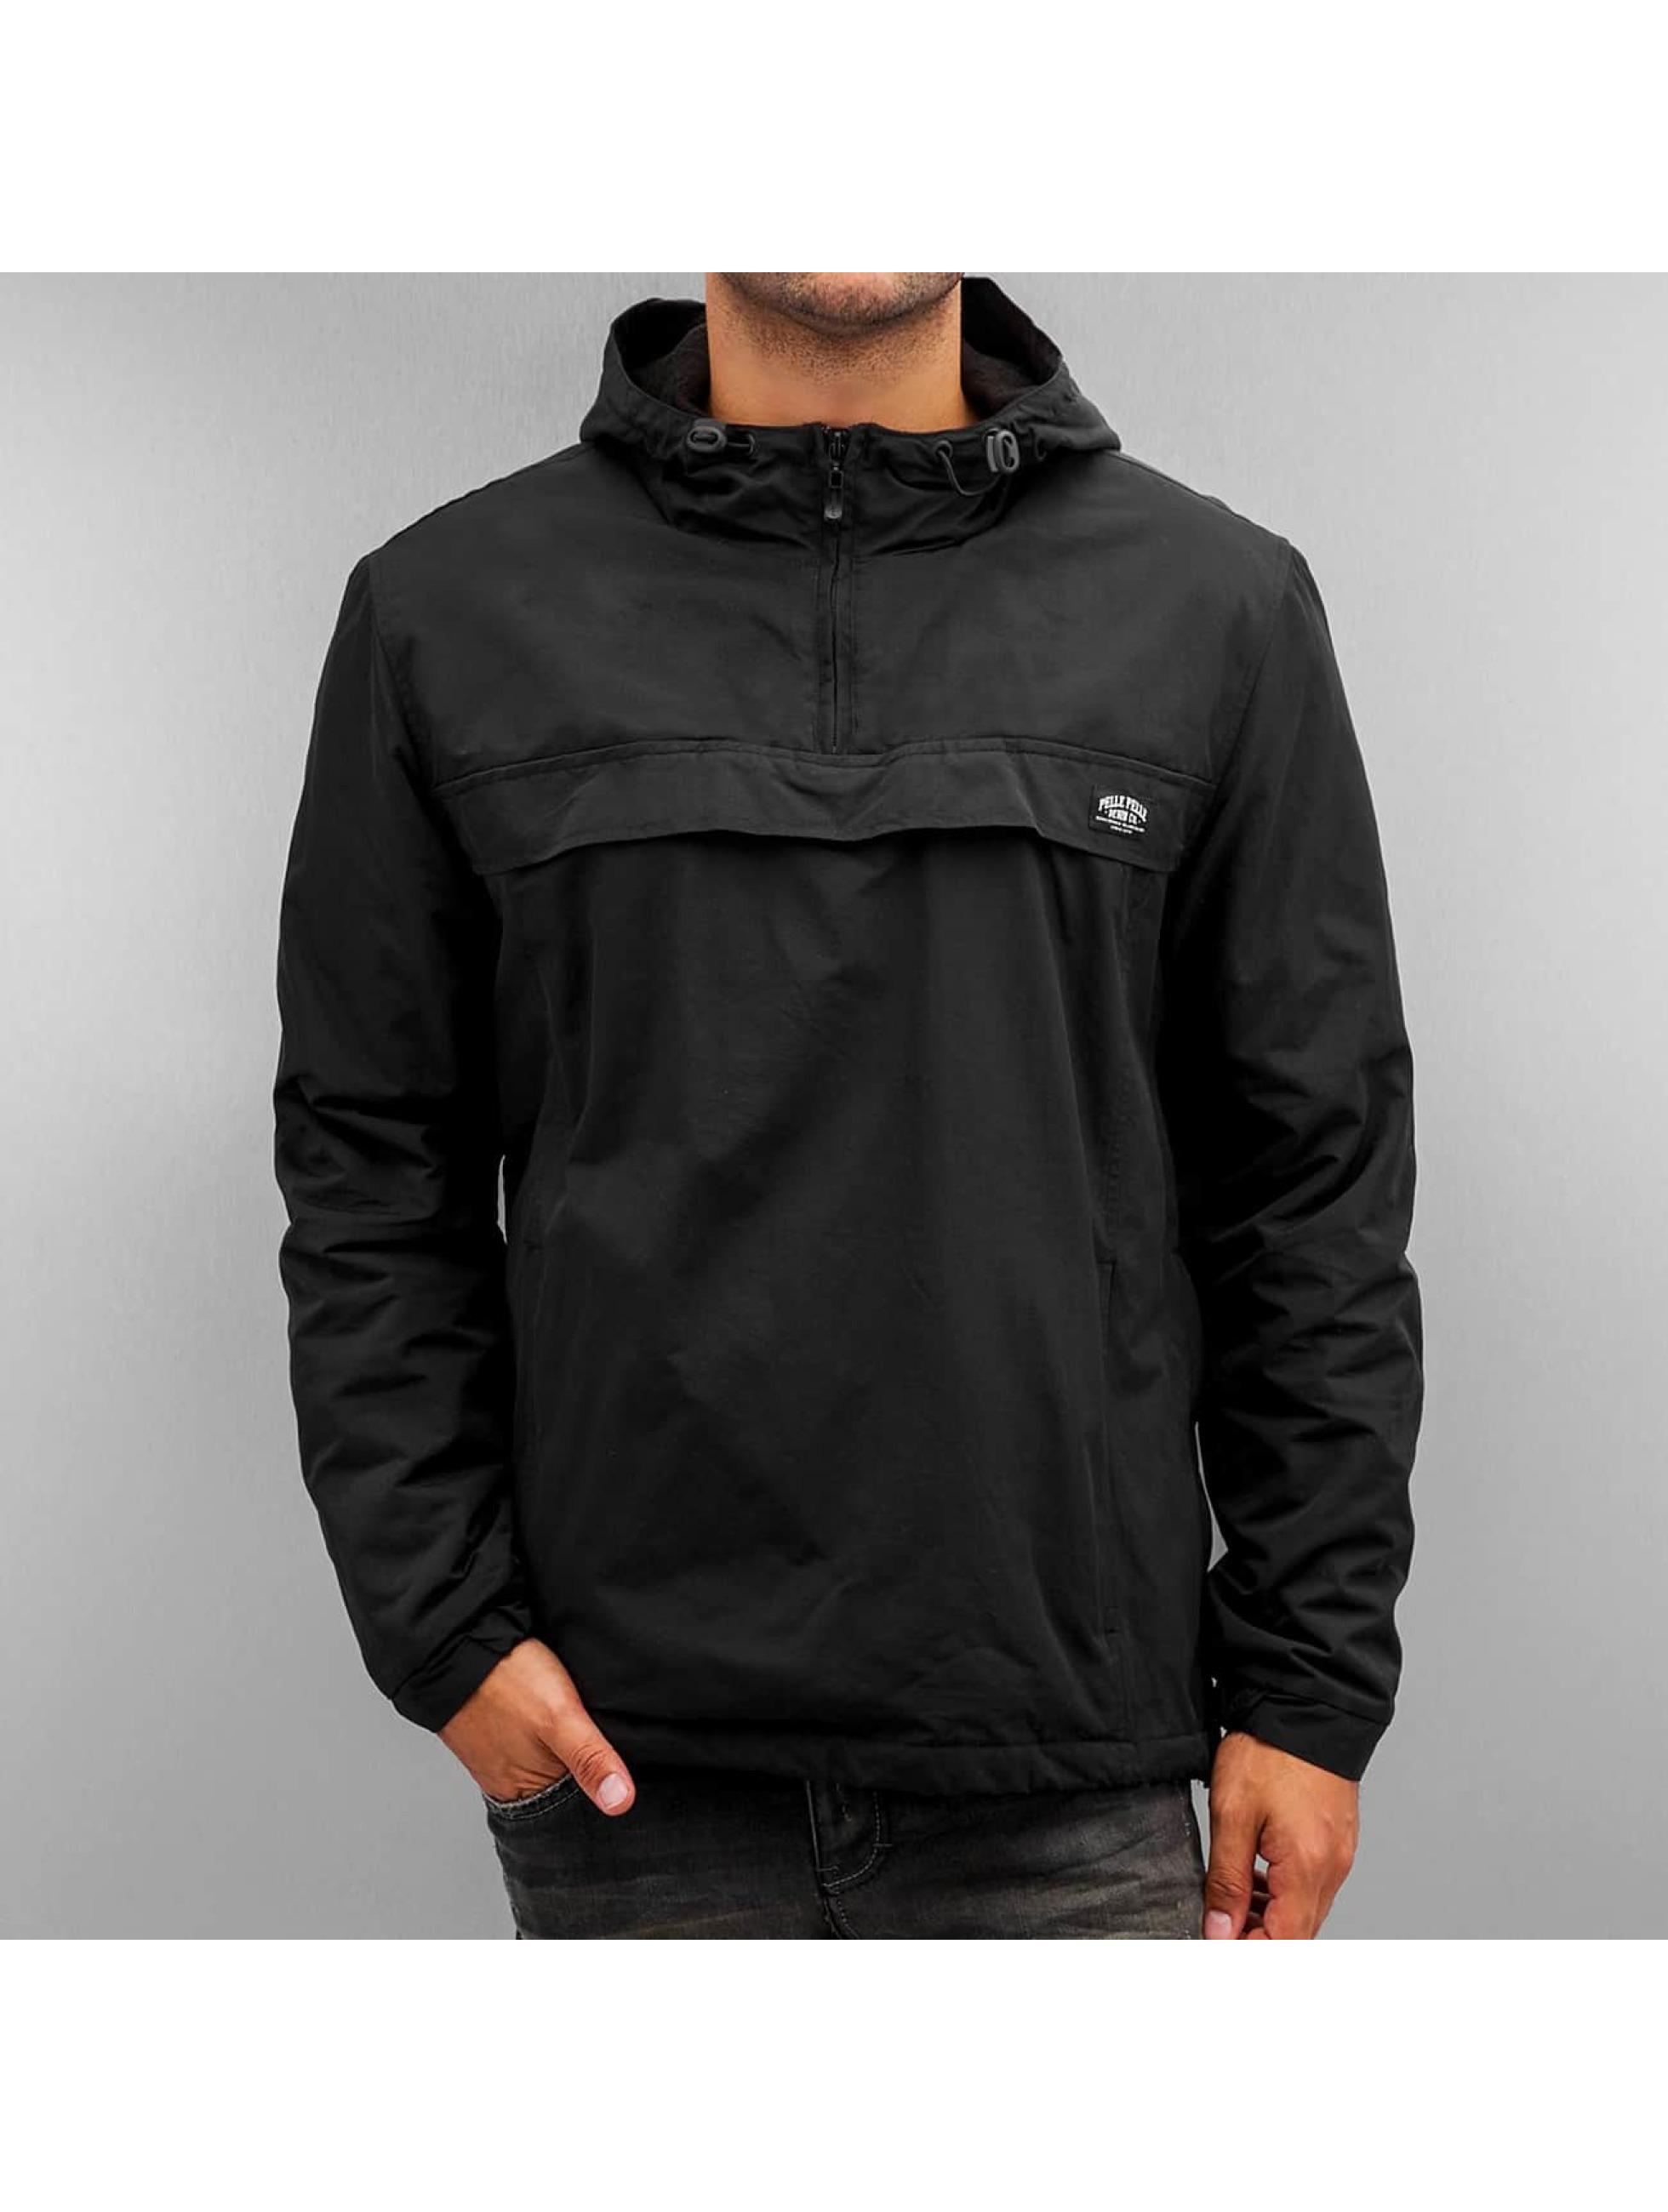 Pelle Pelle Демисезонная куртка Nothern черный